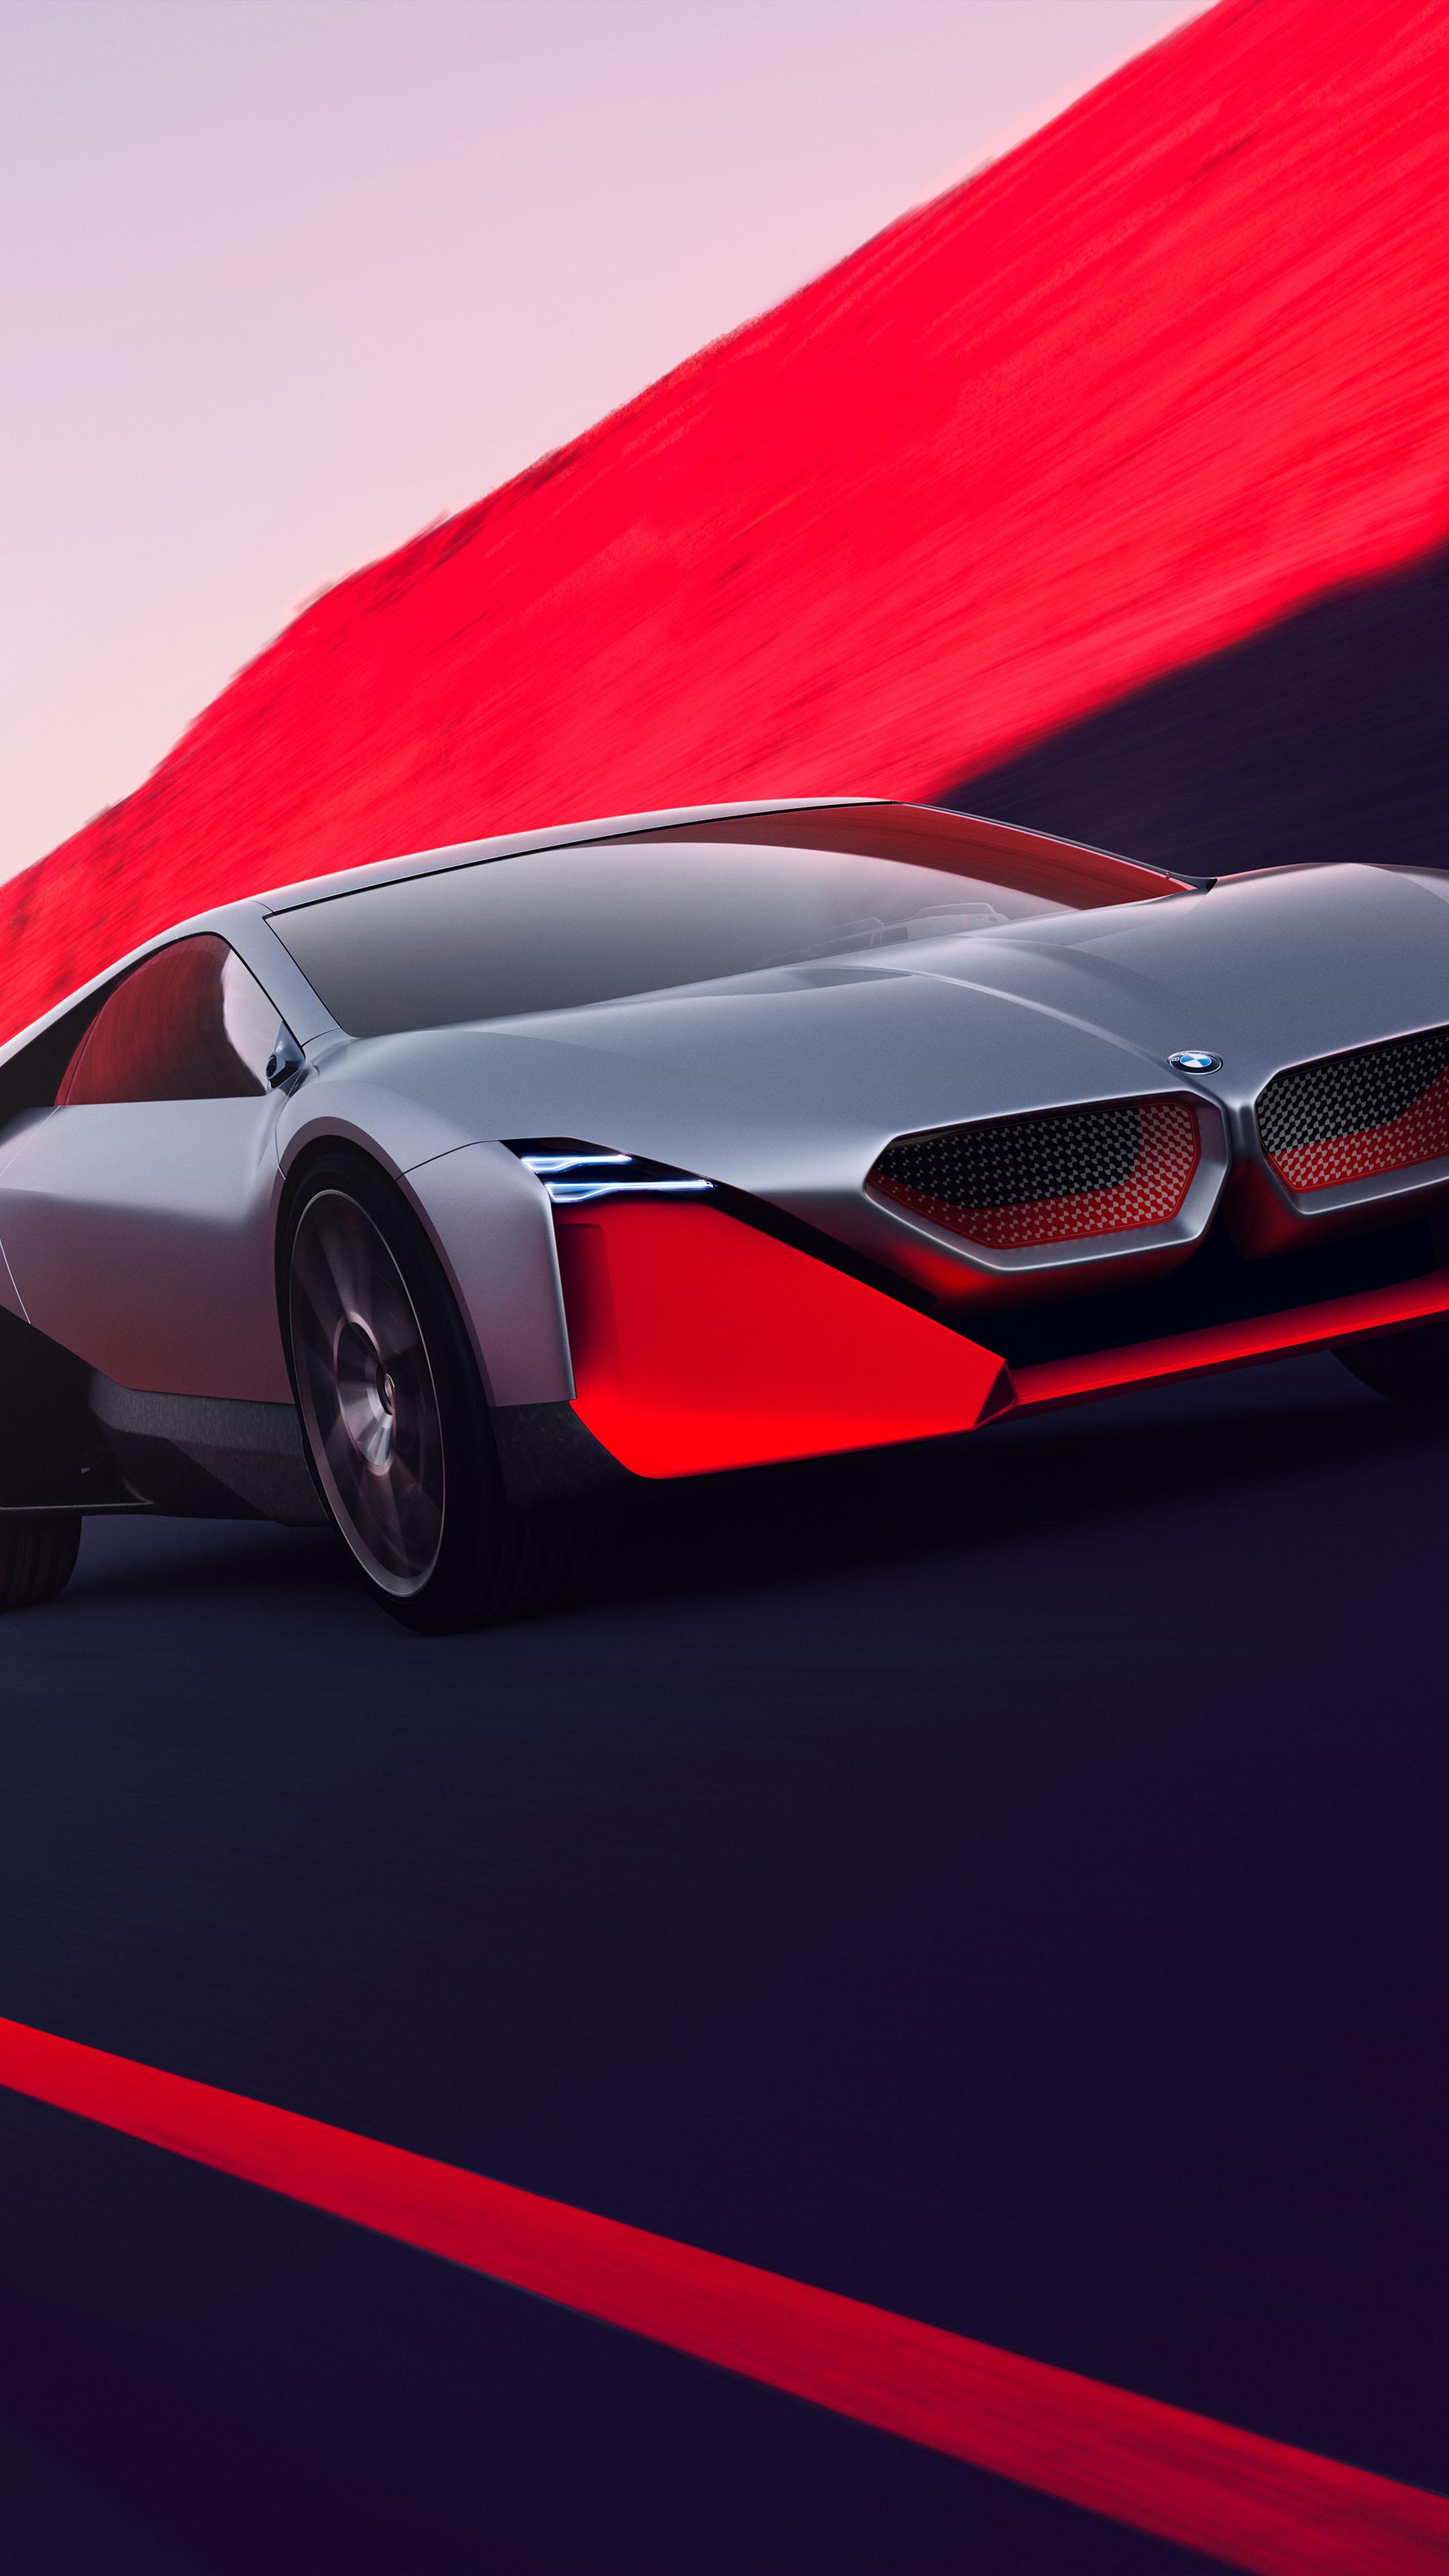 Bmw Vision M Next Concept Car 4k Ultra Hd Mobile Wallpaper